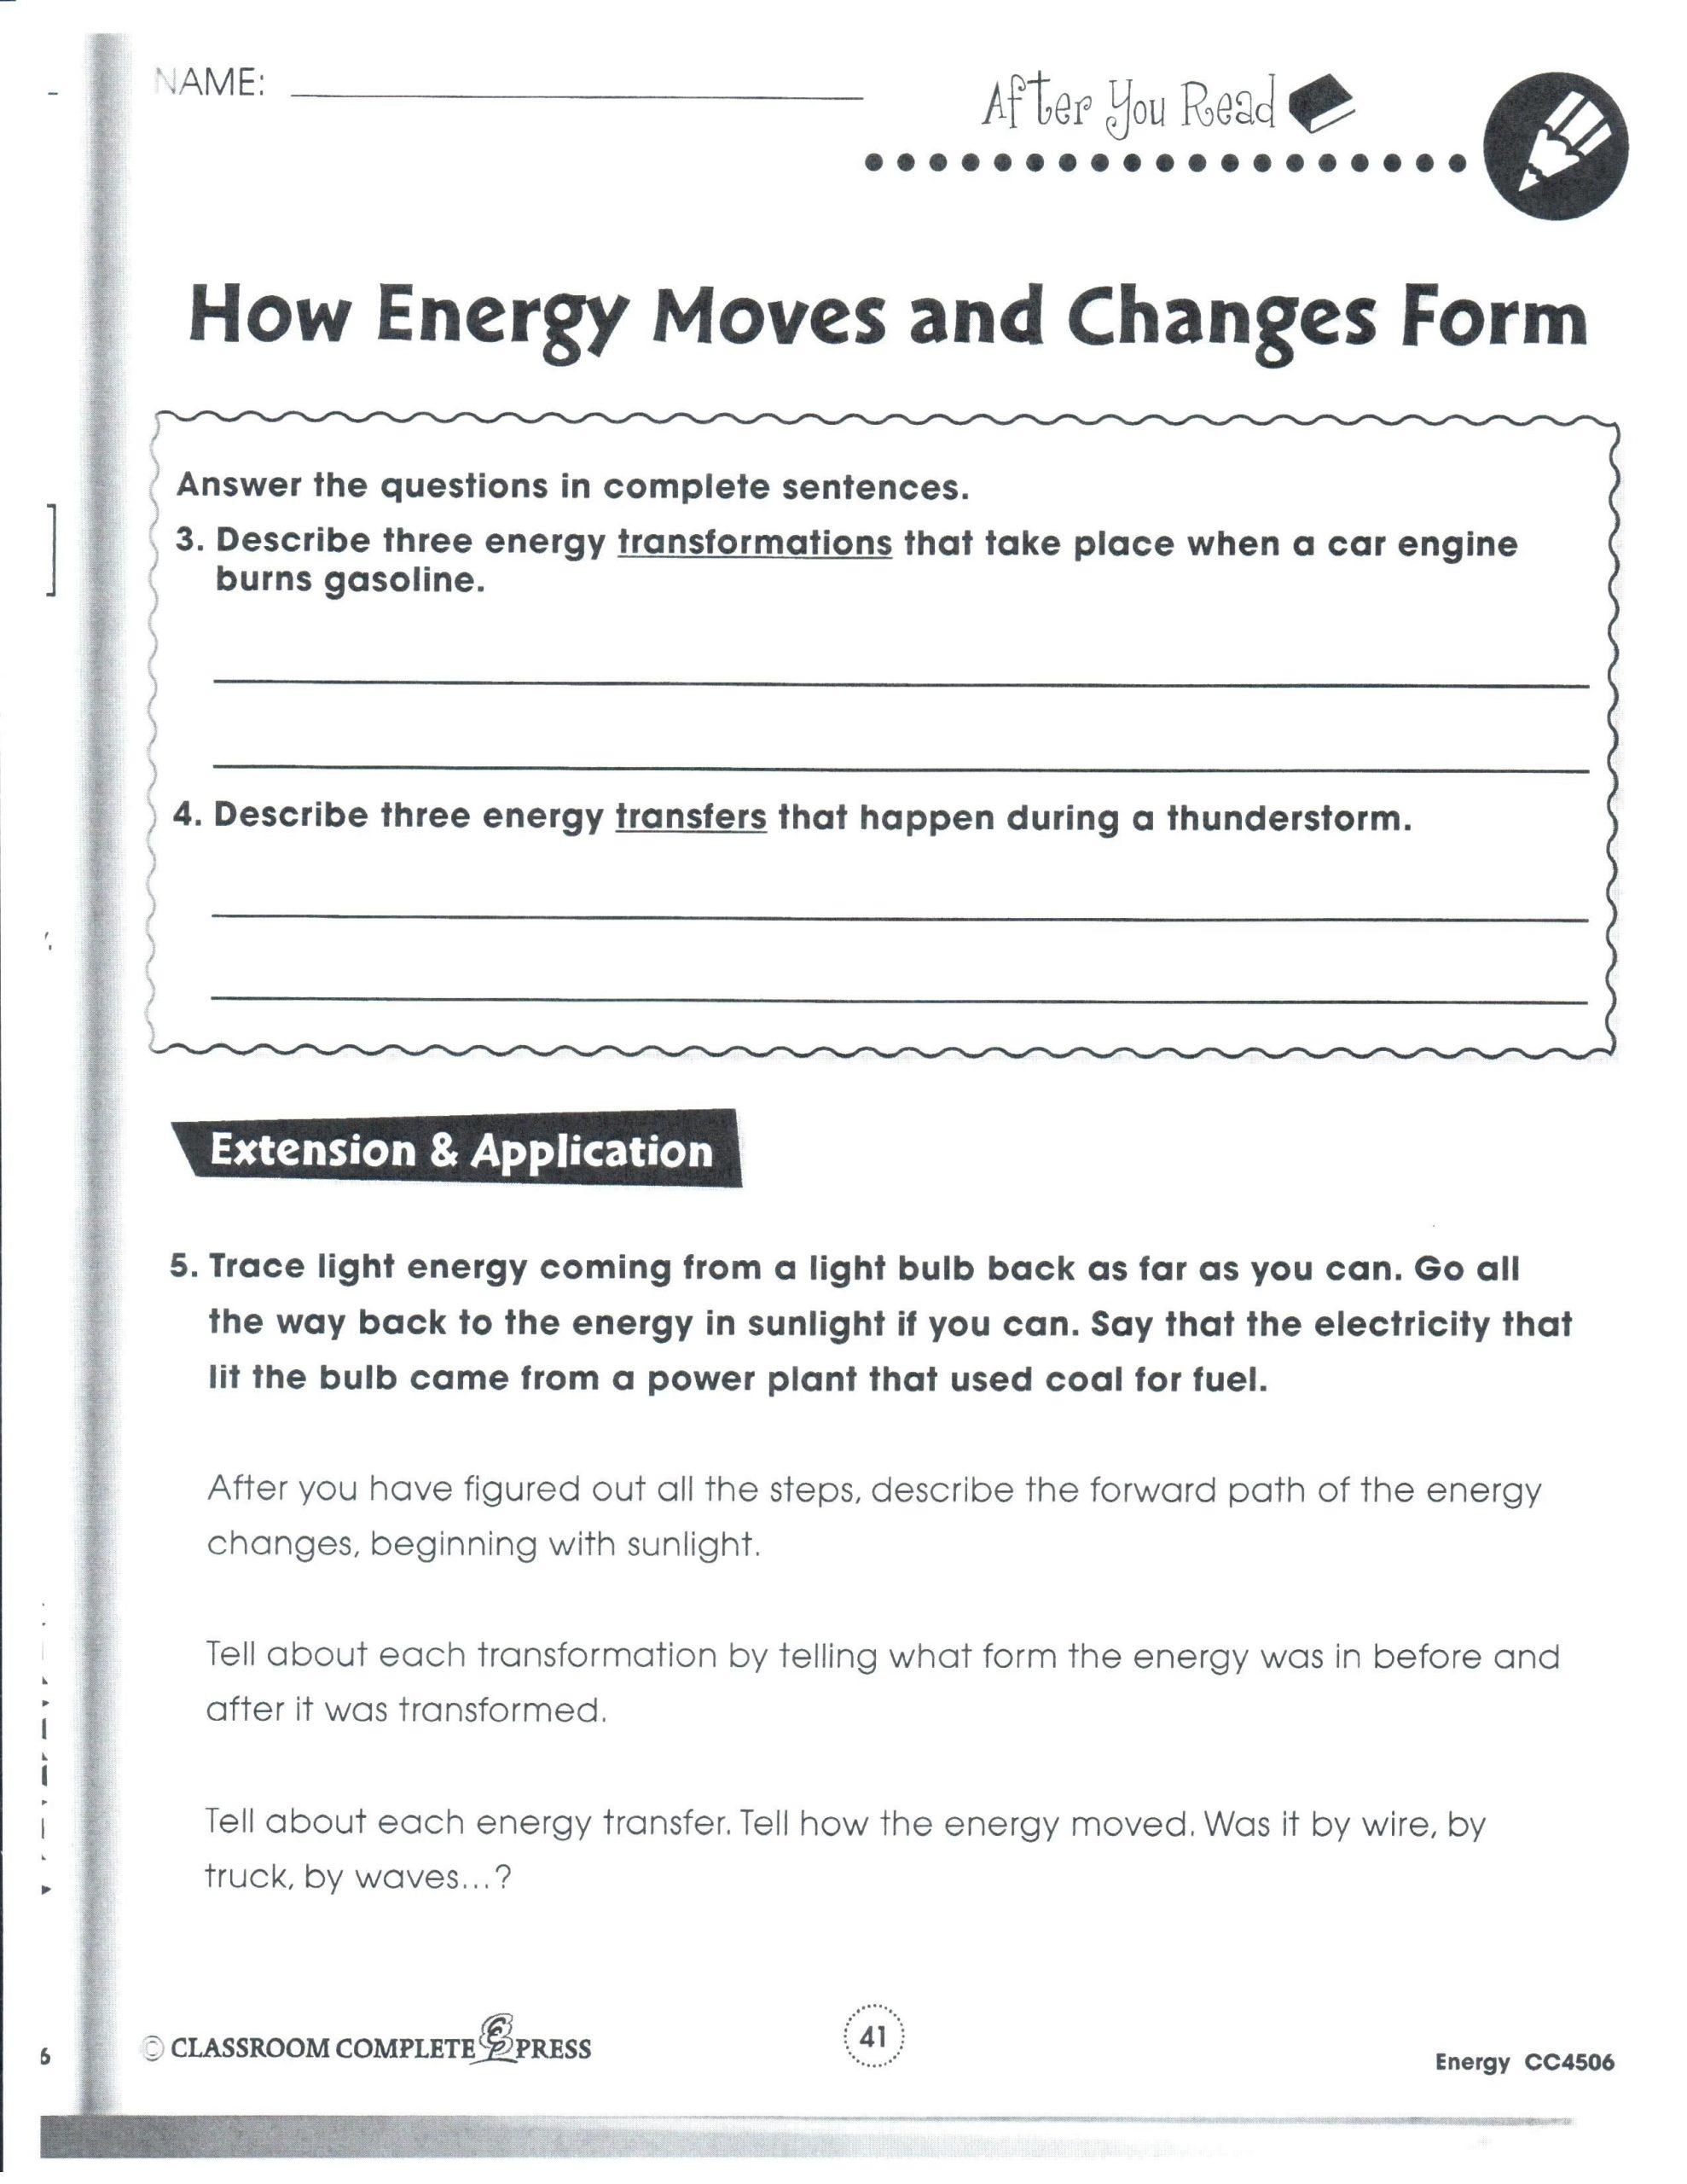 Energy Transformation Worksheet Answer Key Cryptograms Energy Worksheet Answers